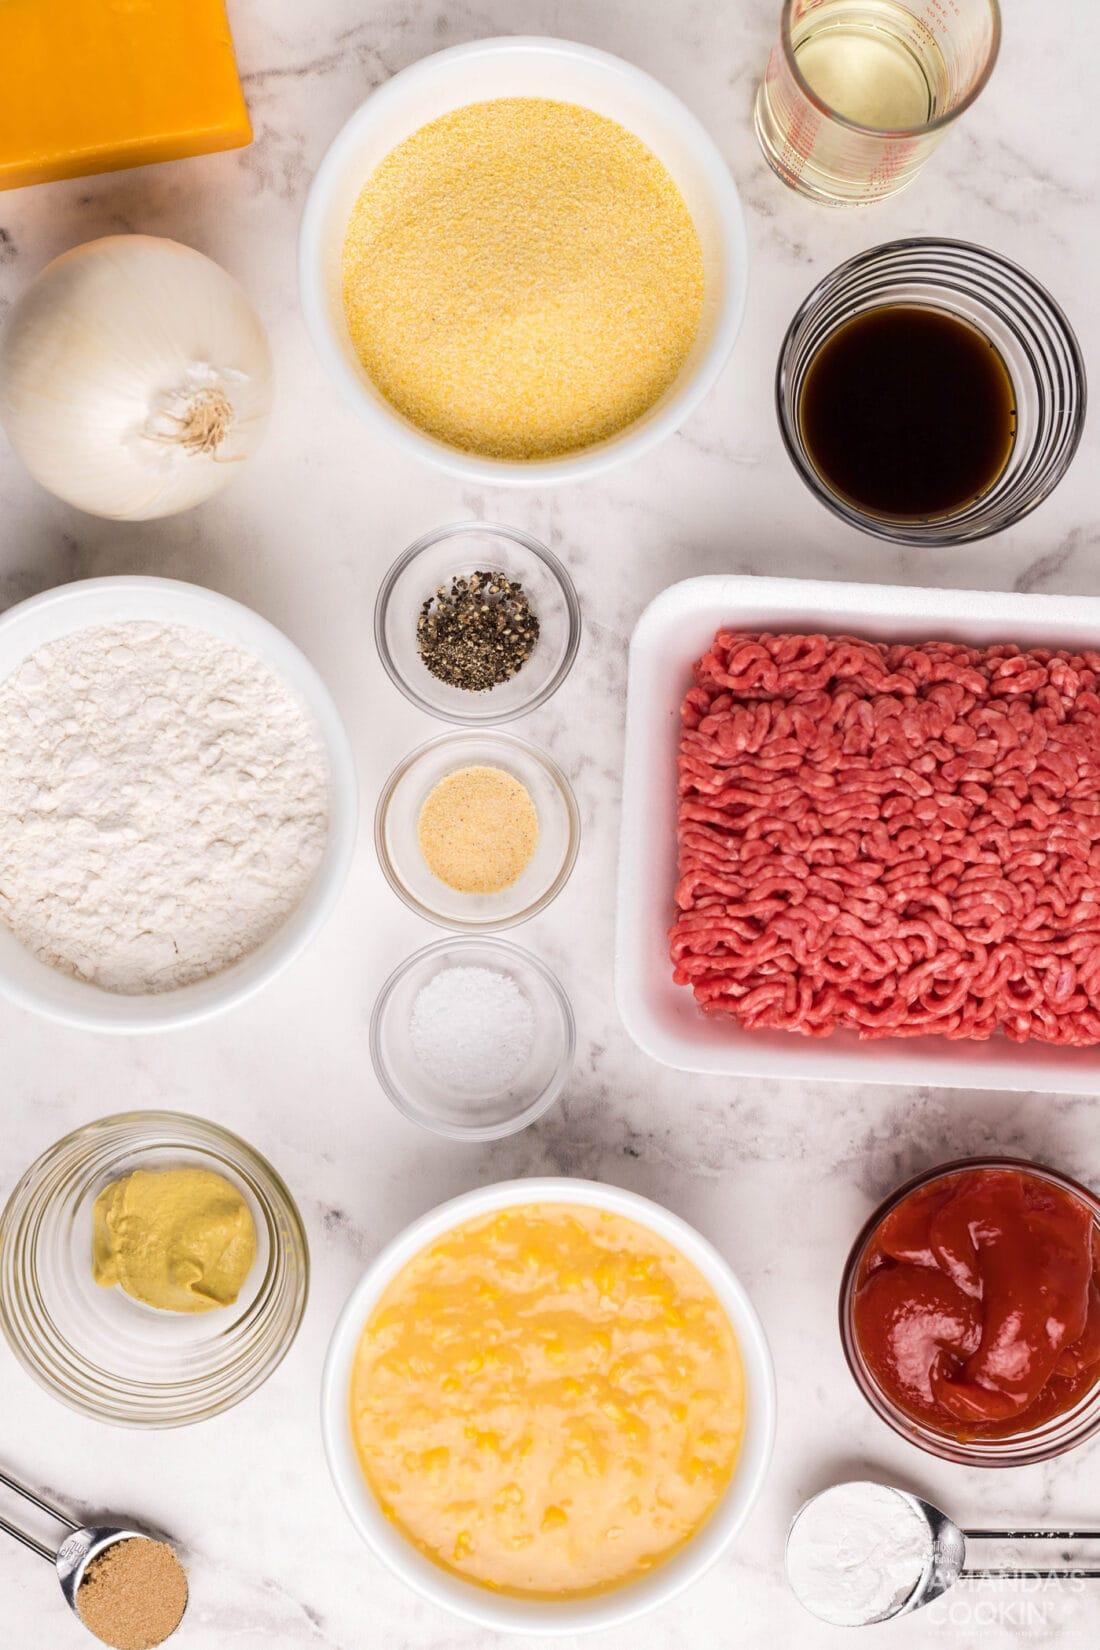 ingredients for Sloppy Joe Corn Muffins